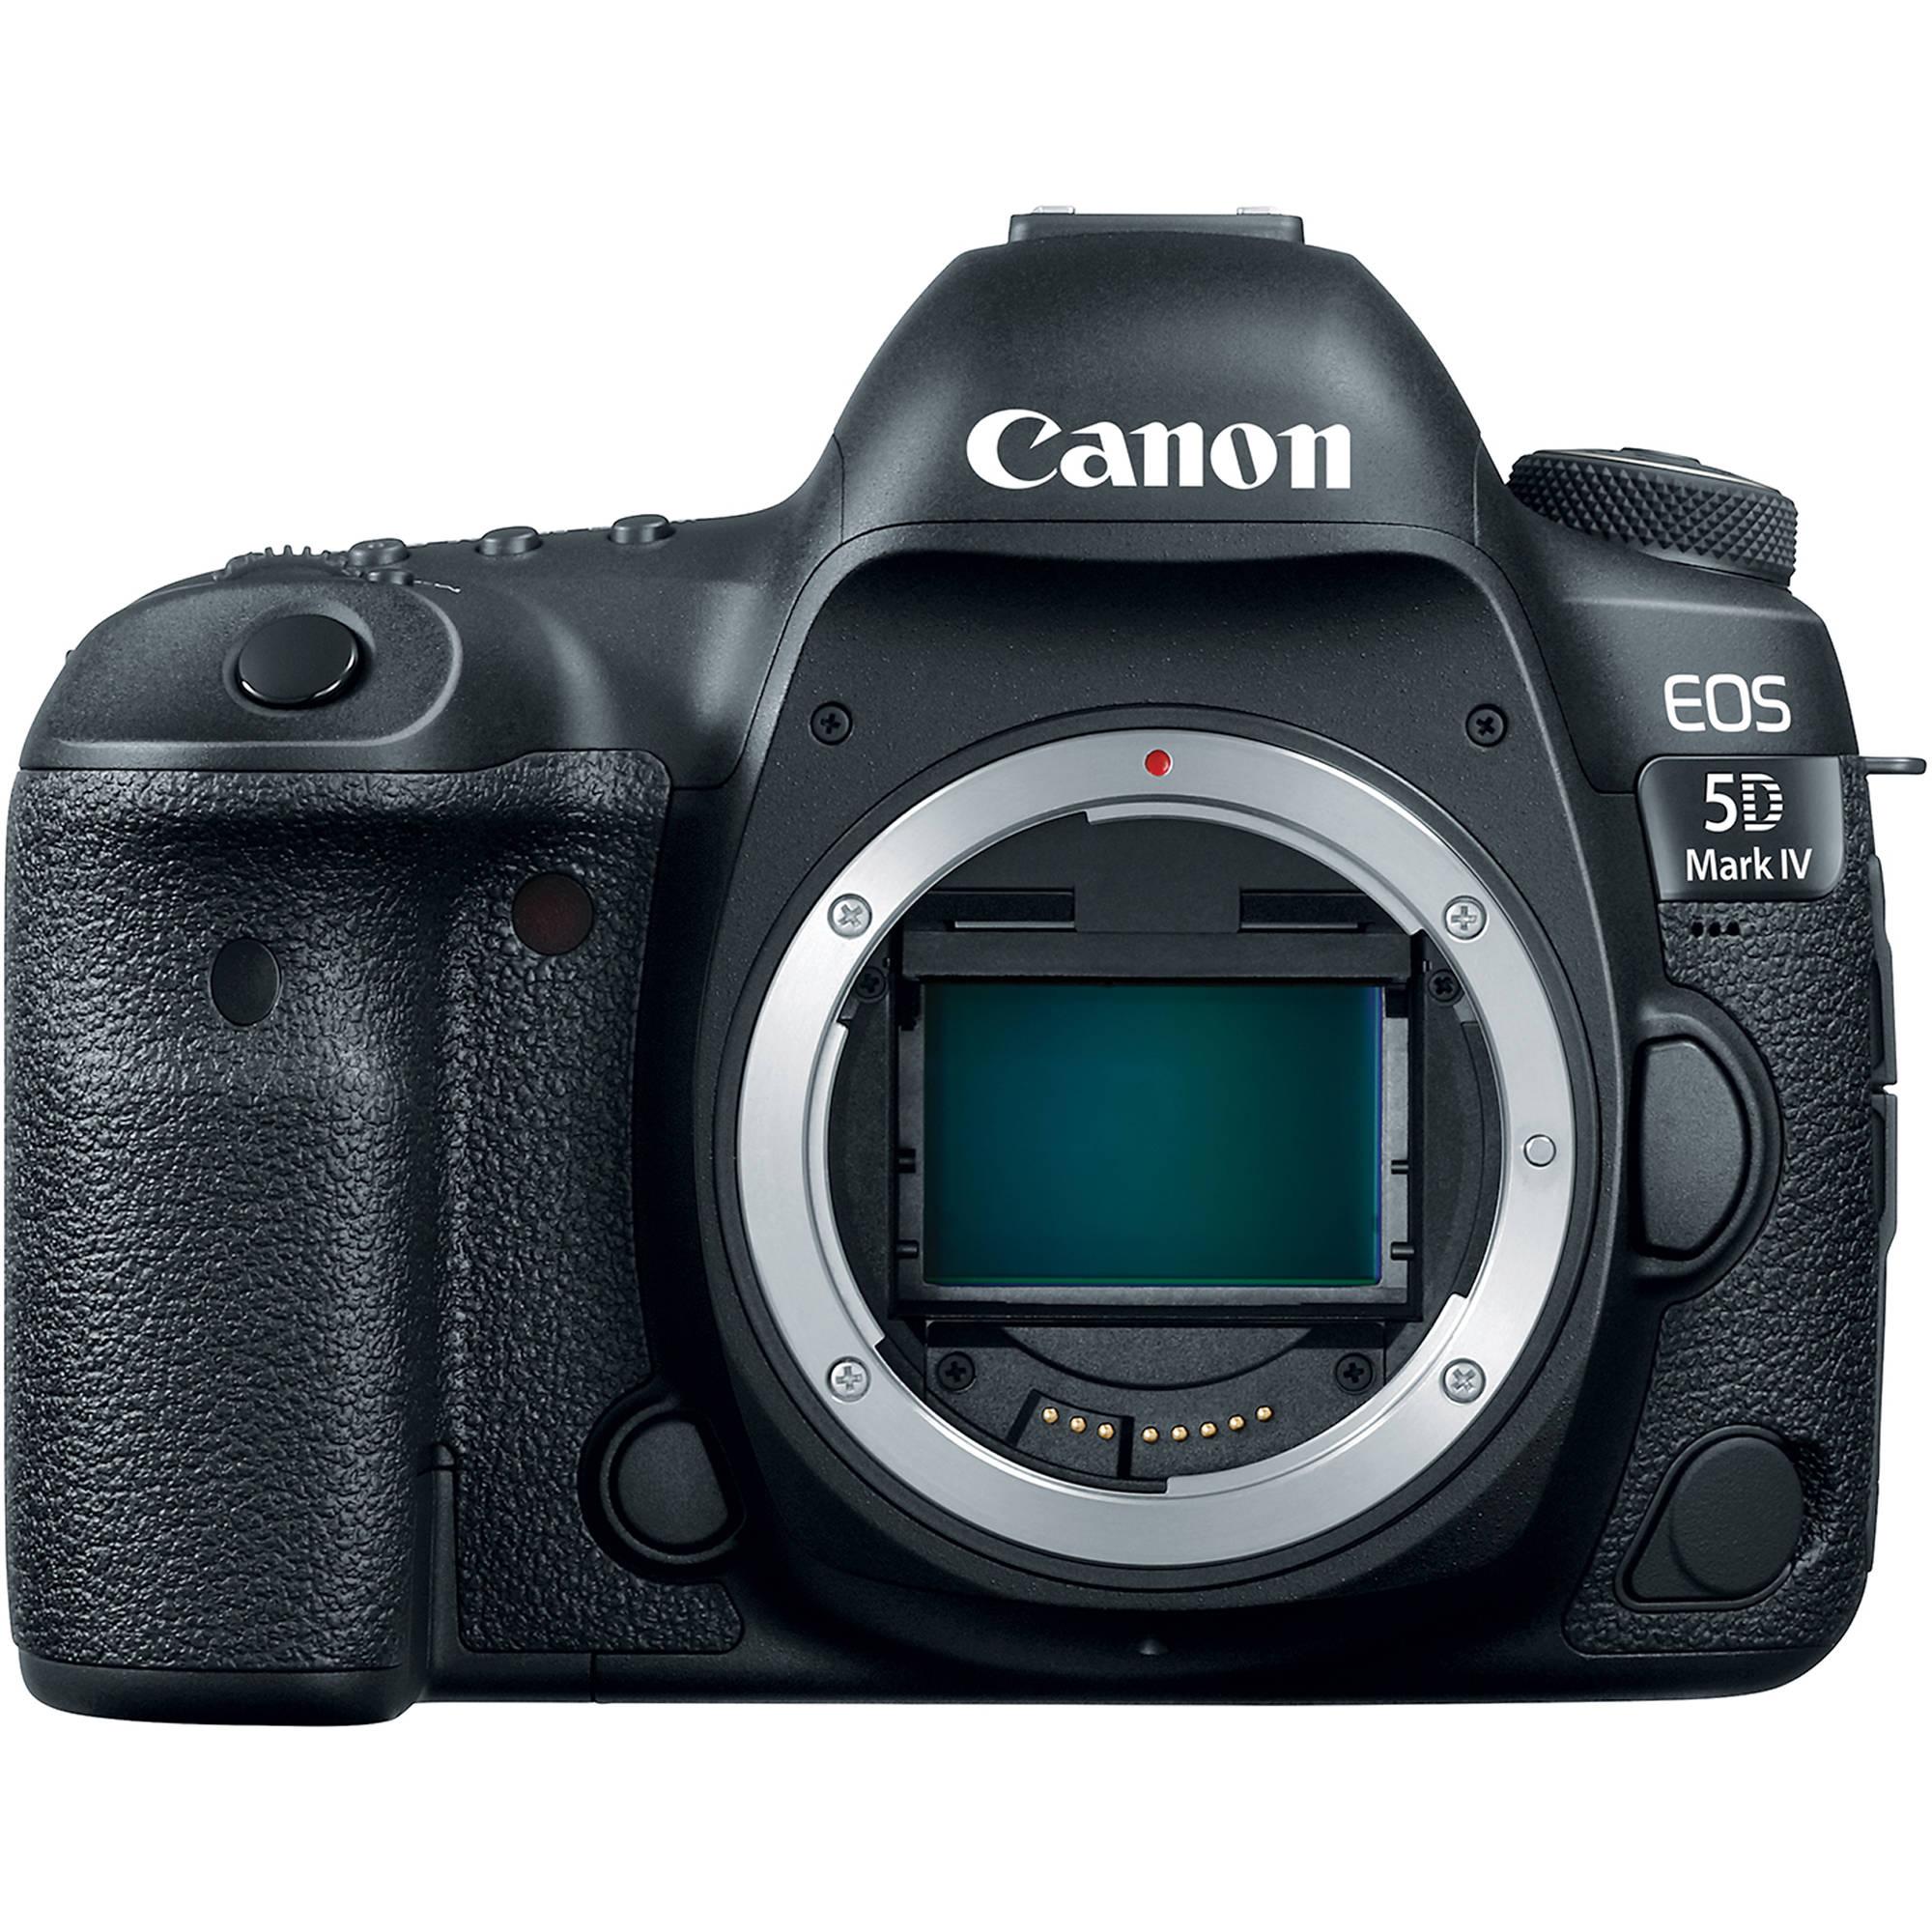 Canon EOS 5D Mark IV Mk4 DSLR Kamera Gehäuse - Neu | eBay